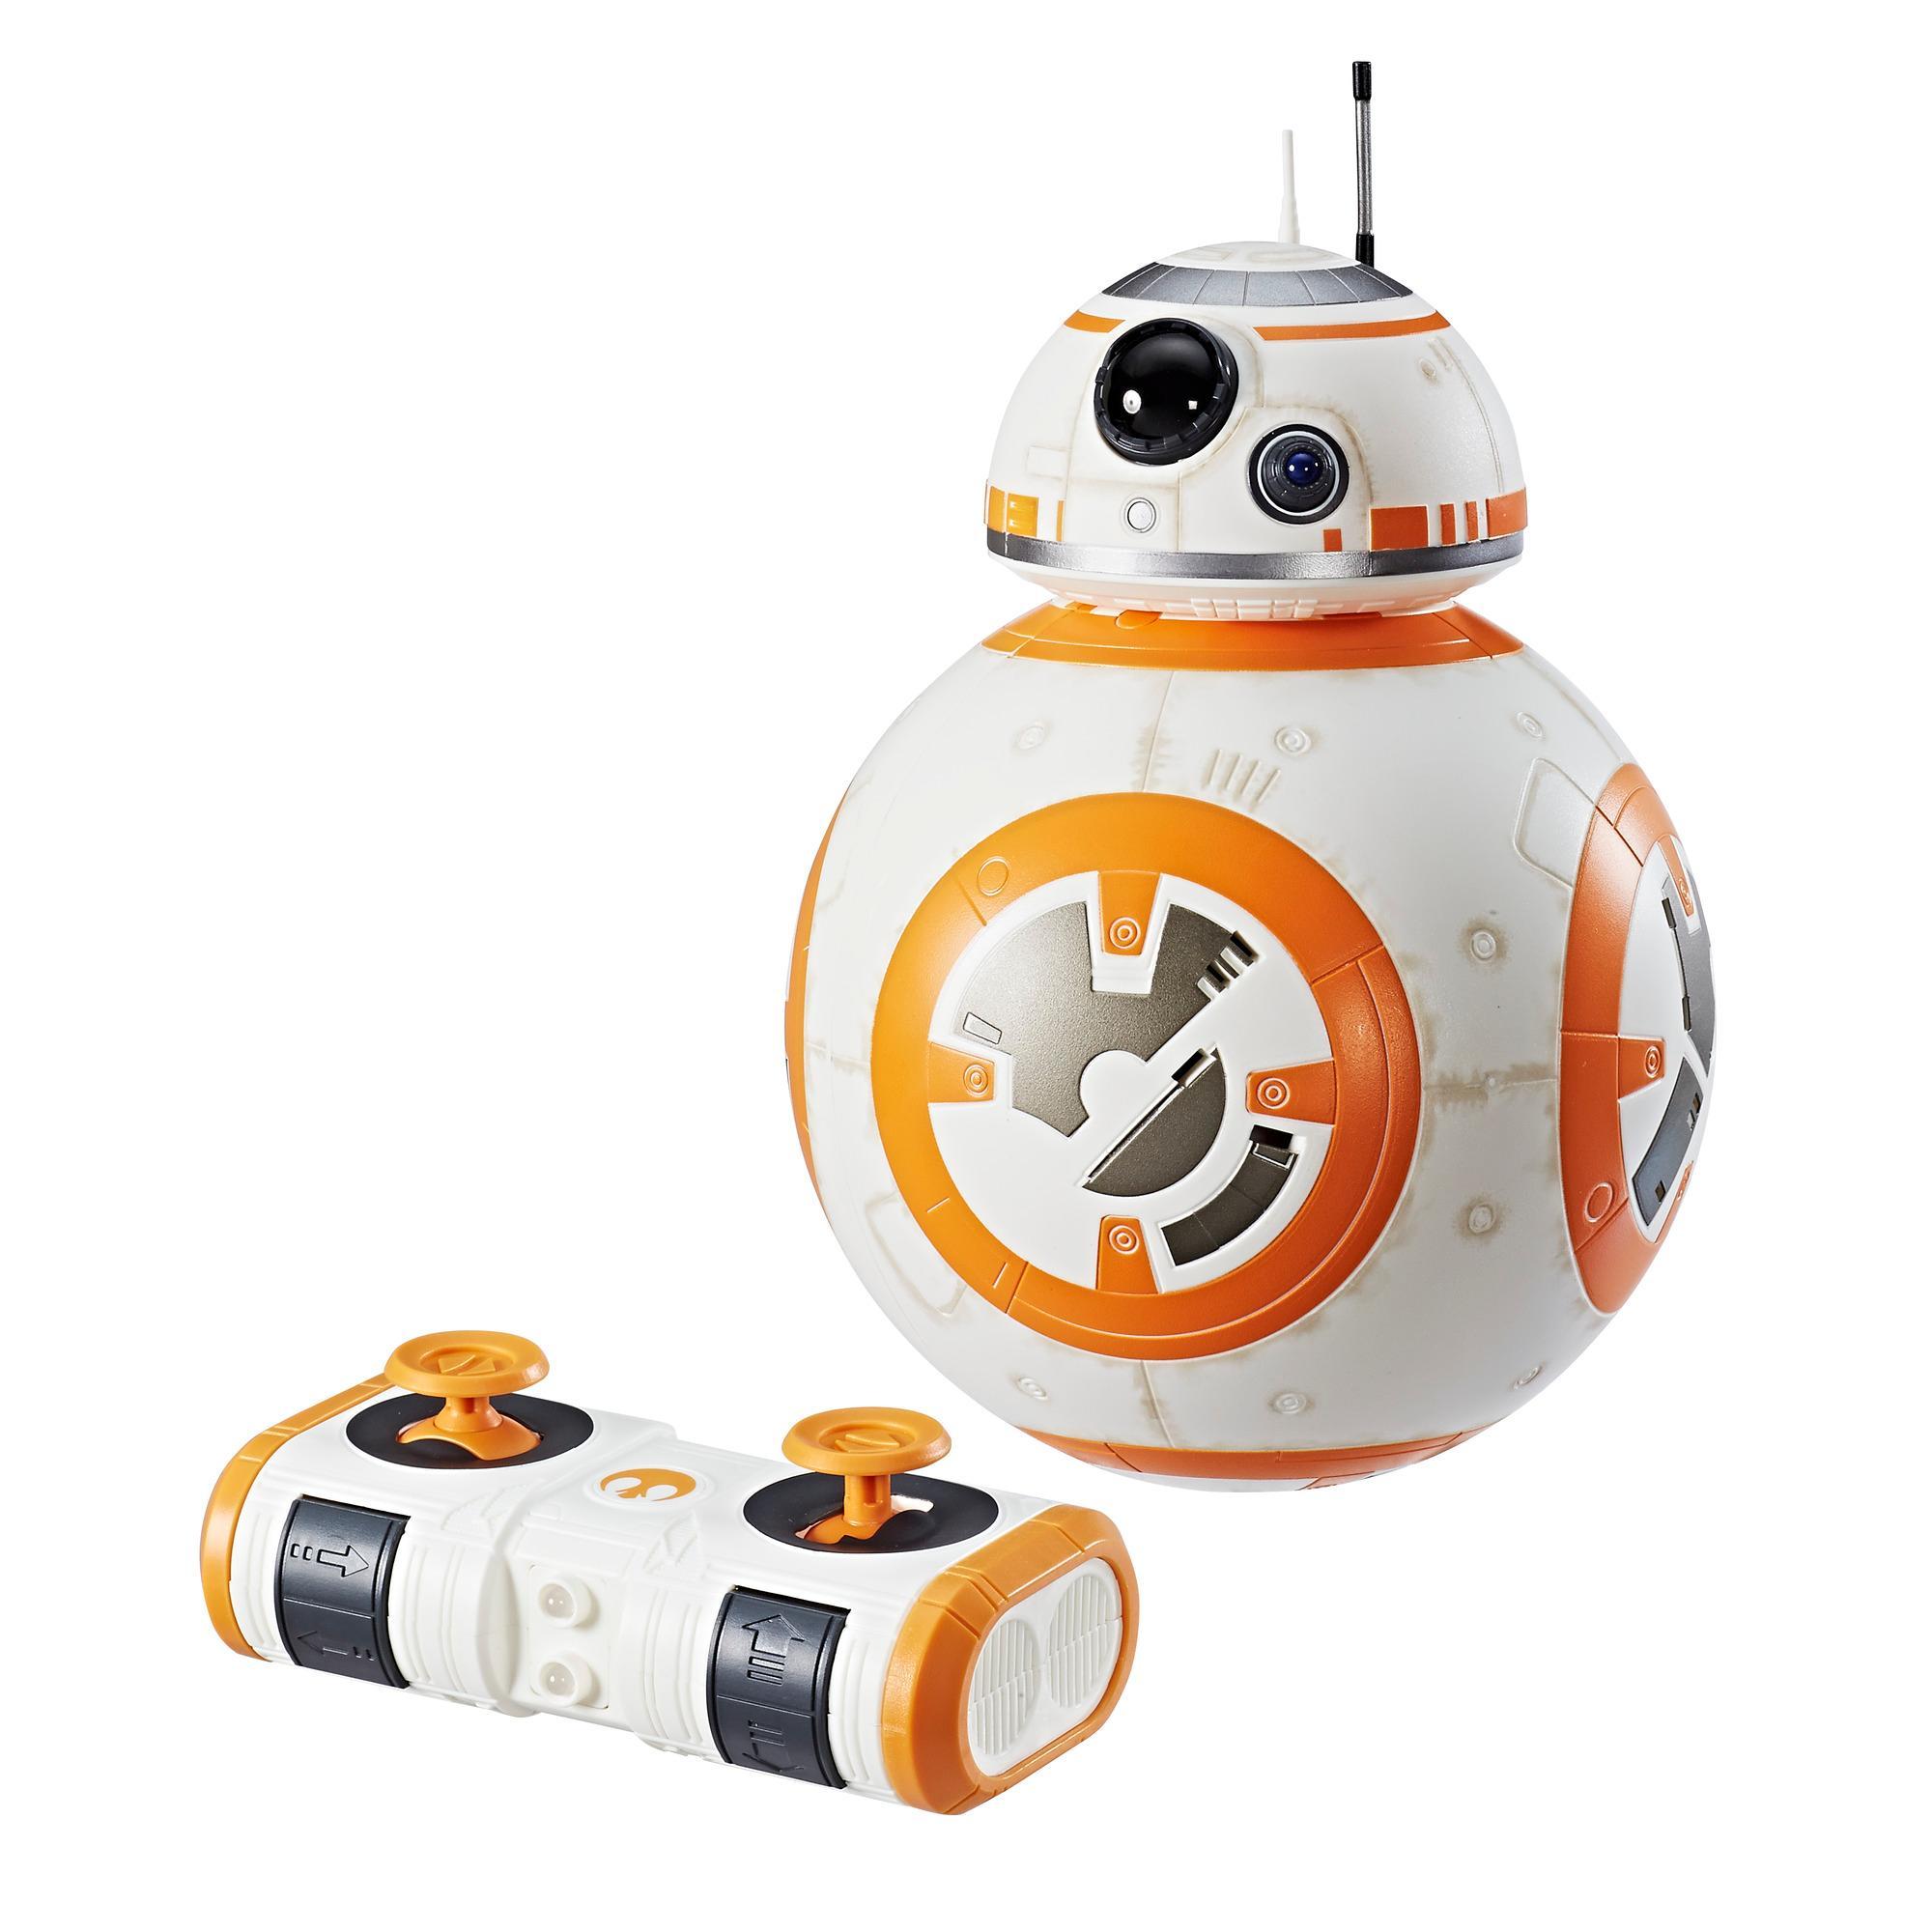 Star Wars: Los últimos Jedi - Hyperdrive BB-8